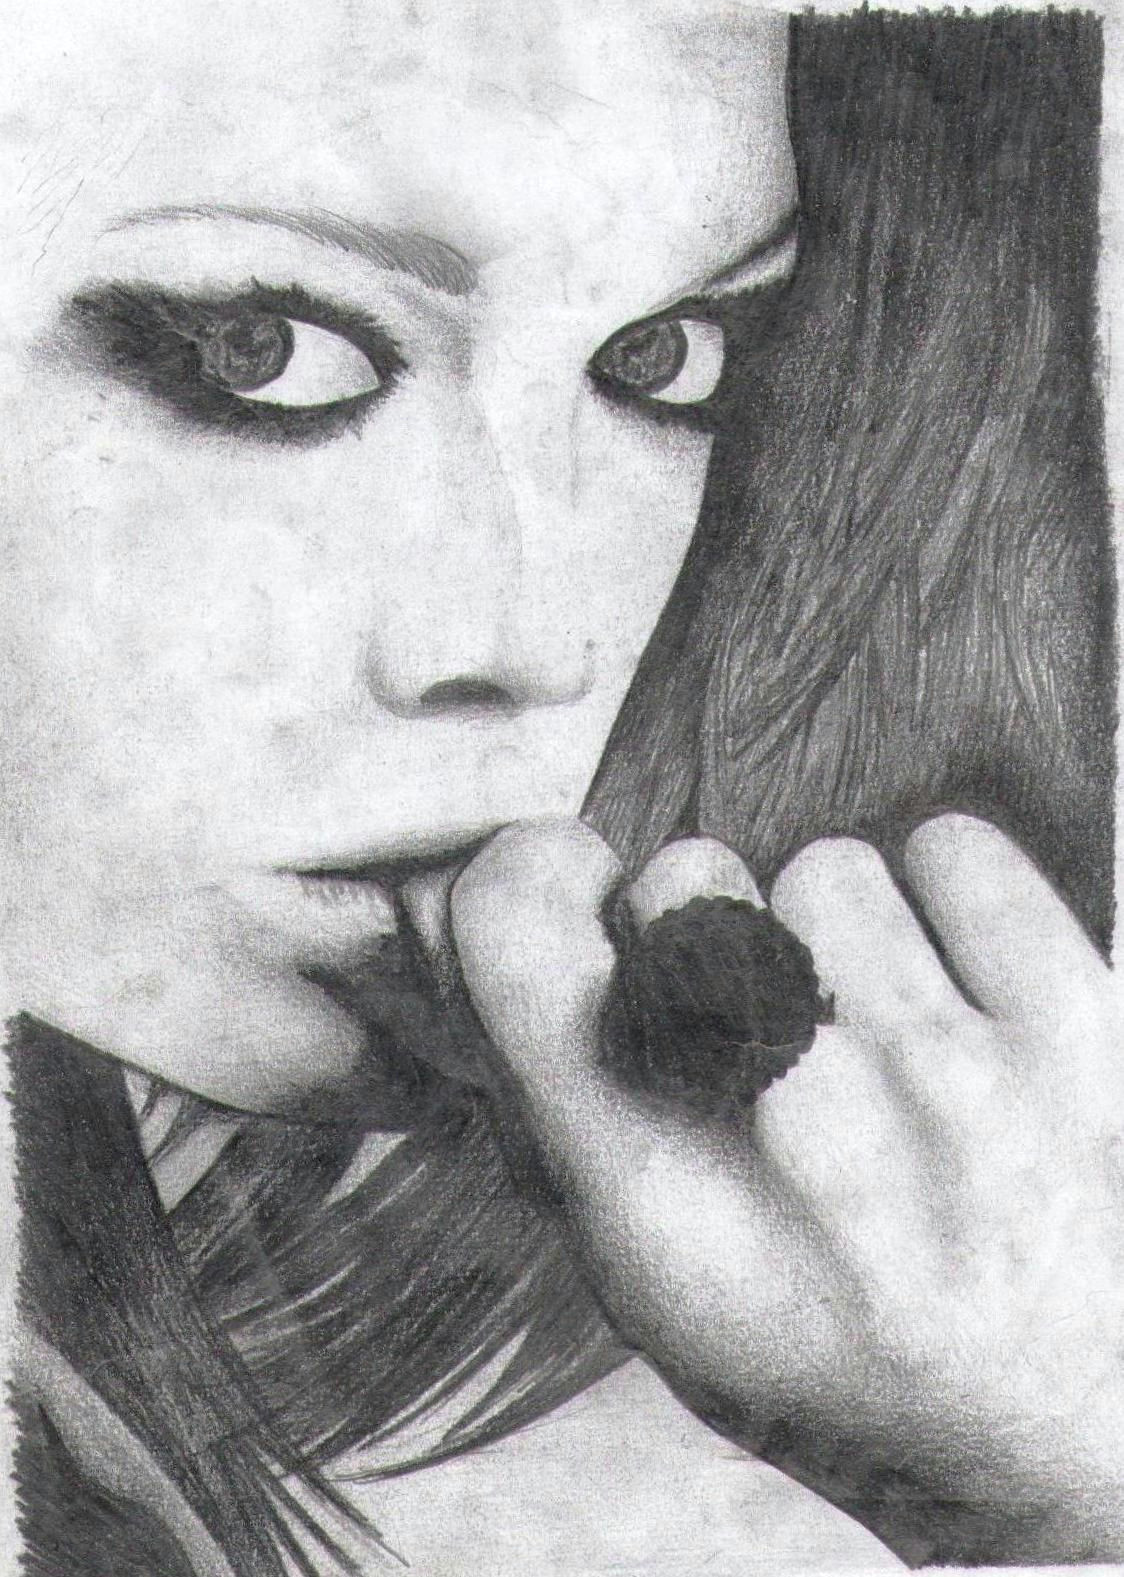 pencil drawing pencil blackandwhite woman face hair hands eyes beautiful